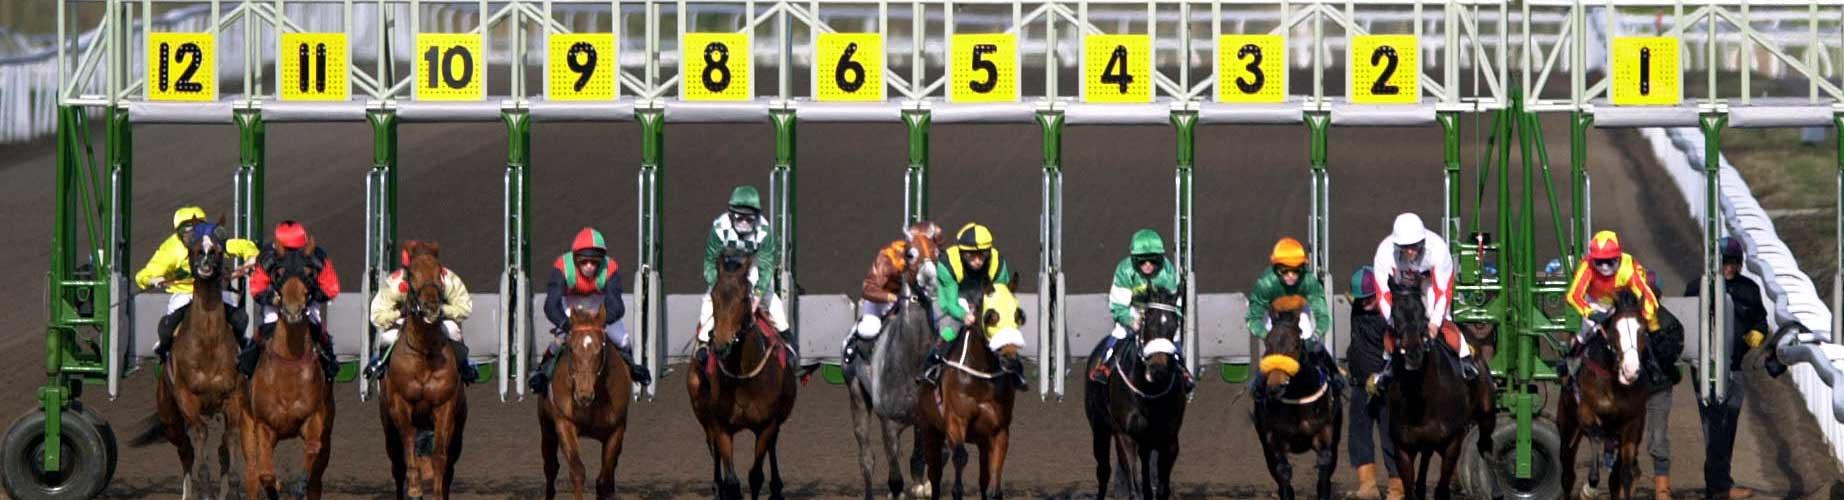 How do u bet on horse racing betting skins csgo lounge betting